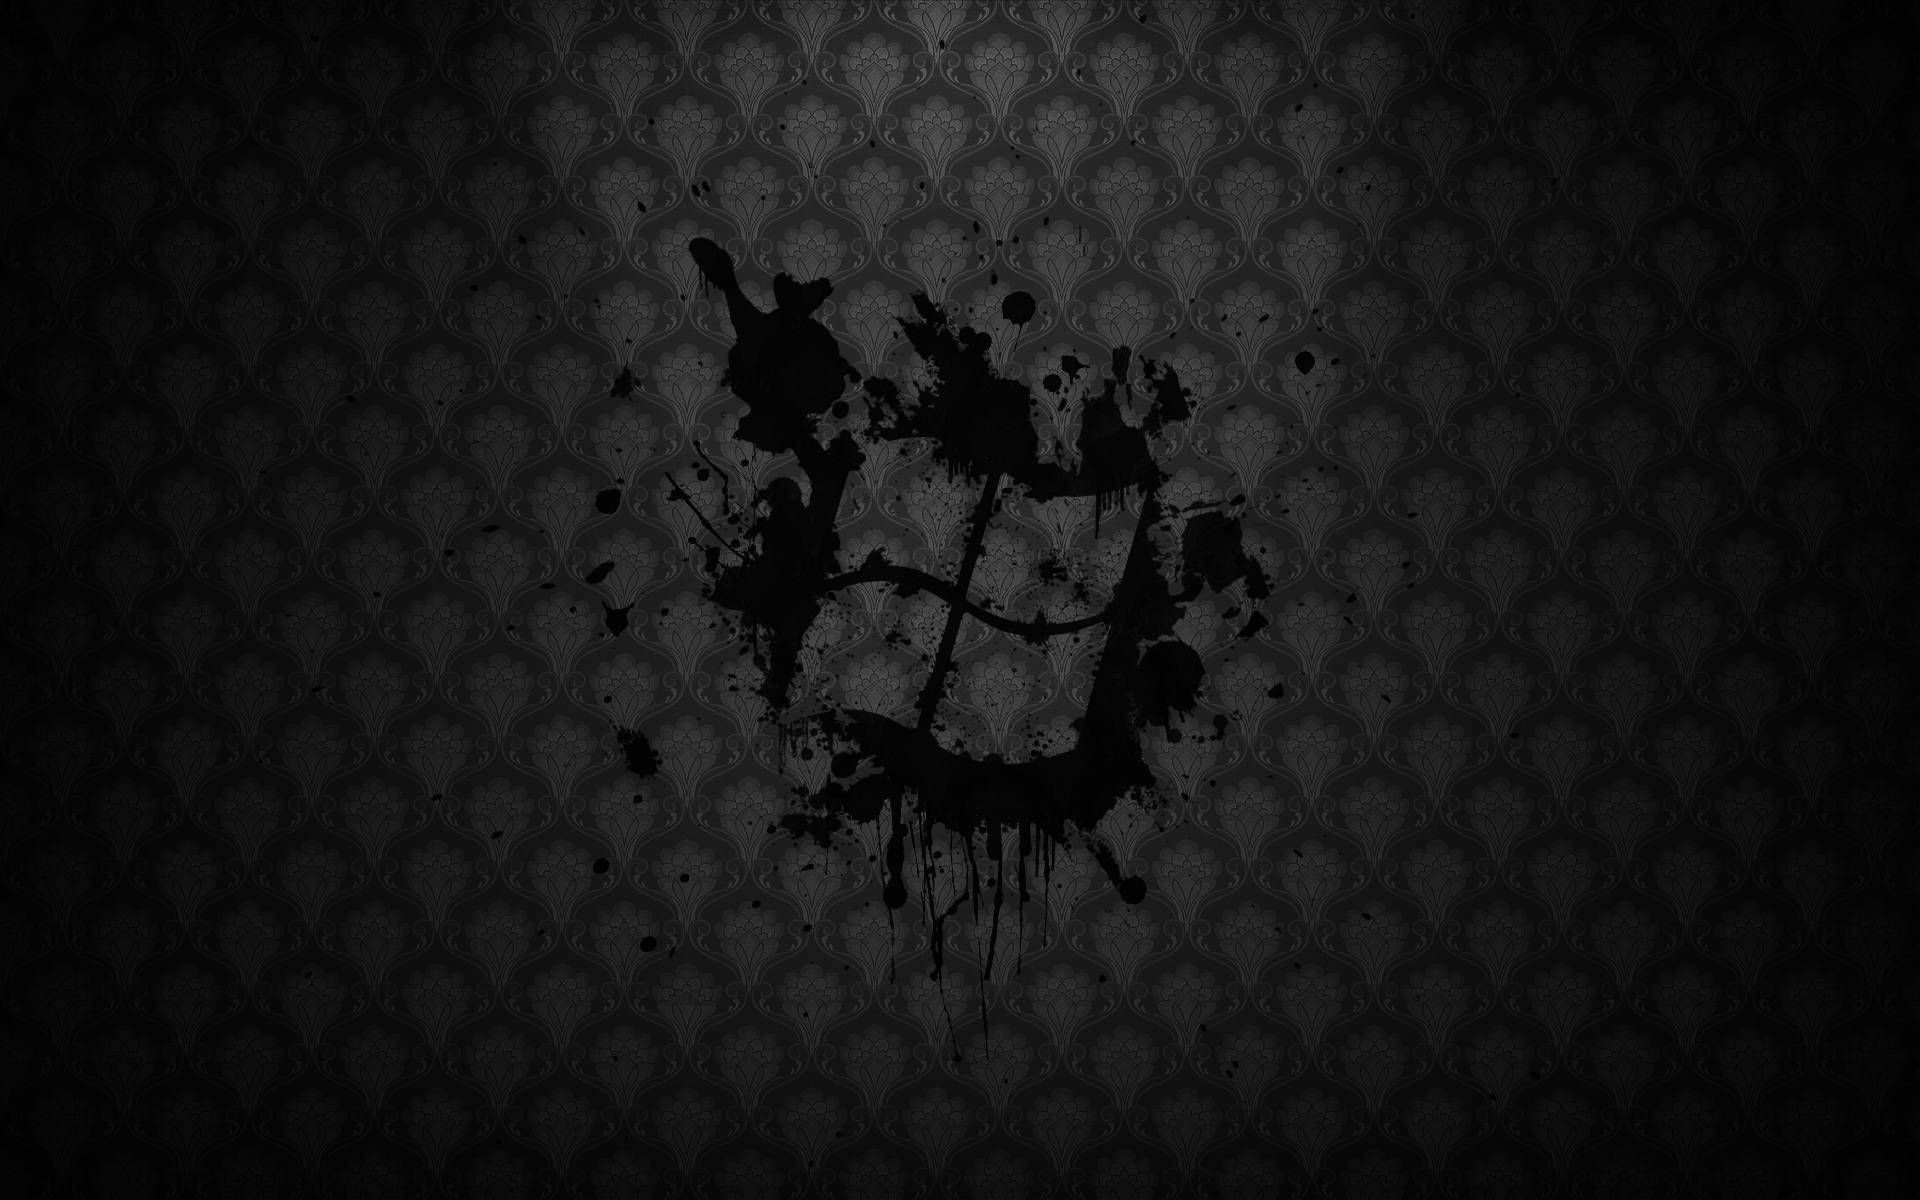 Fantastic Wallpaper High Quality Windows 8 - e96453ae32b9acfdb6ce20c80fc040de  Snapshot_362757.jpg